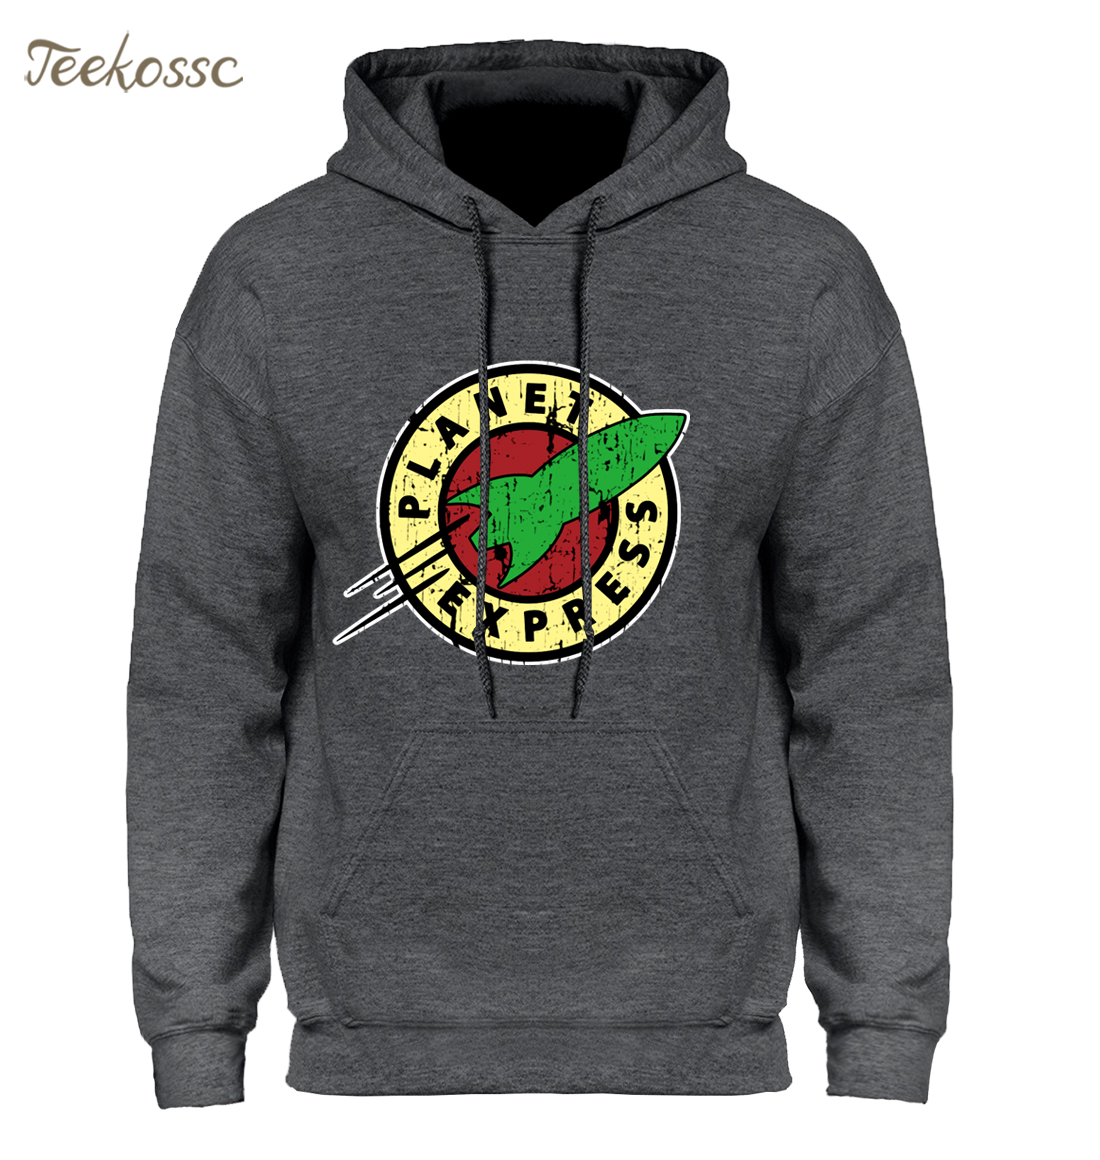 Planet Express Hoodie Men Cartoon Hooded Sweatshirt Cool Hoodies Sweatshirt Men 2019 Winter Spring Fleece Hipster Streetwear